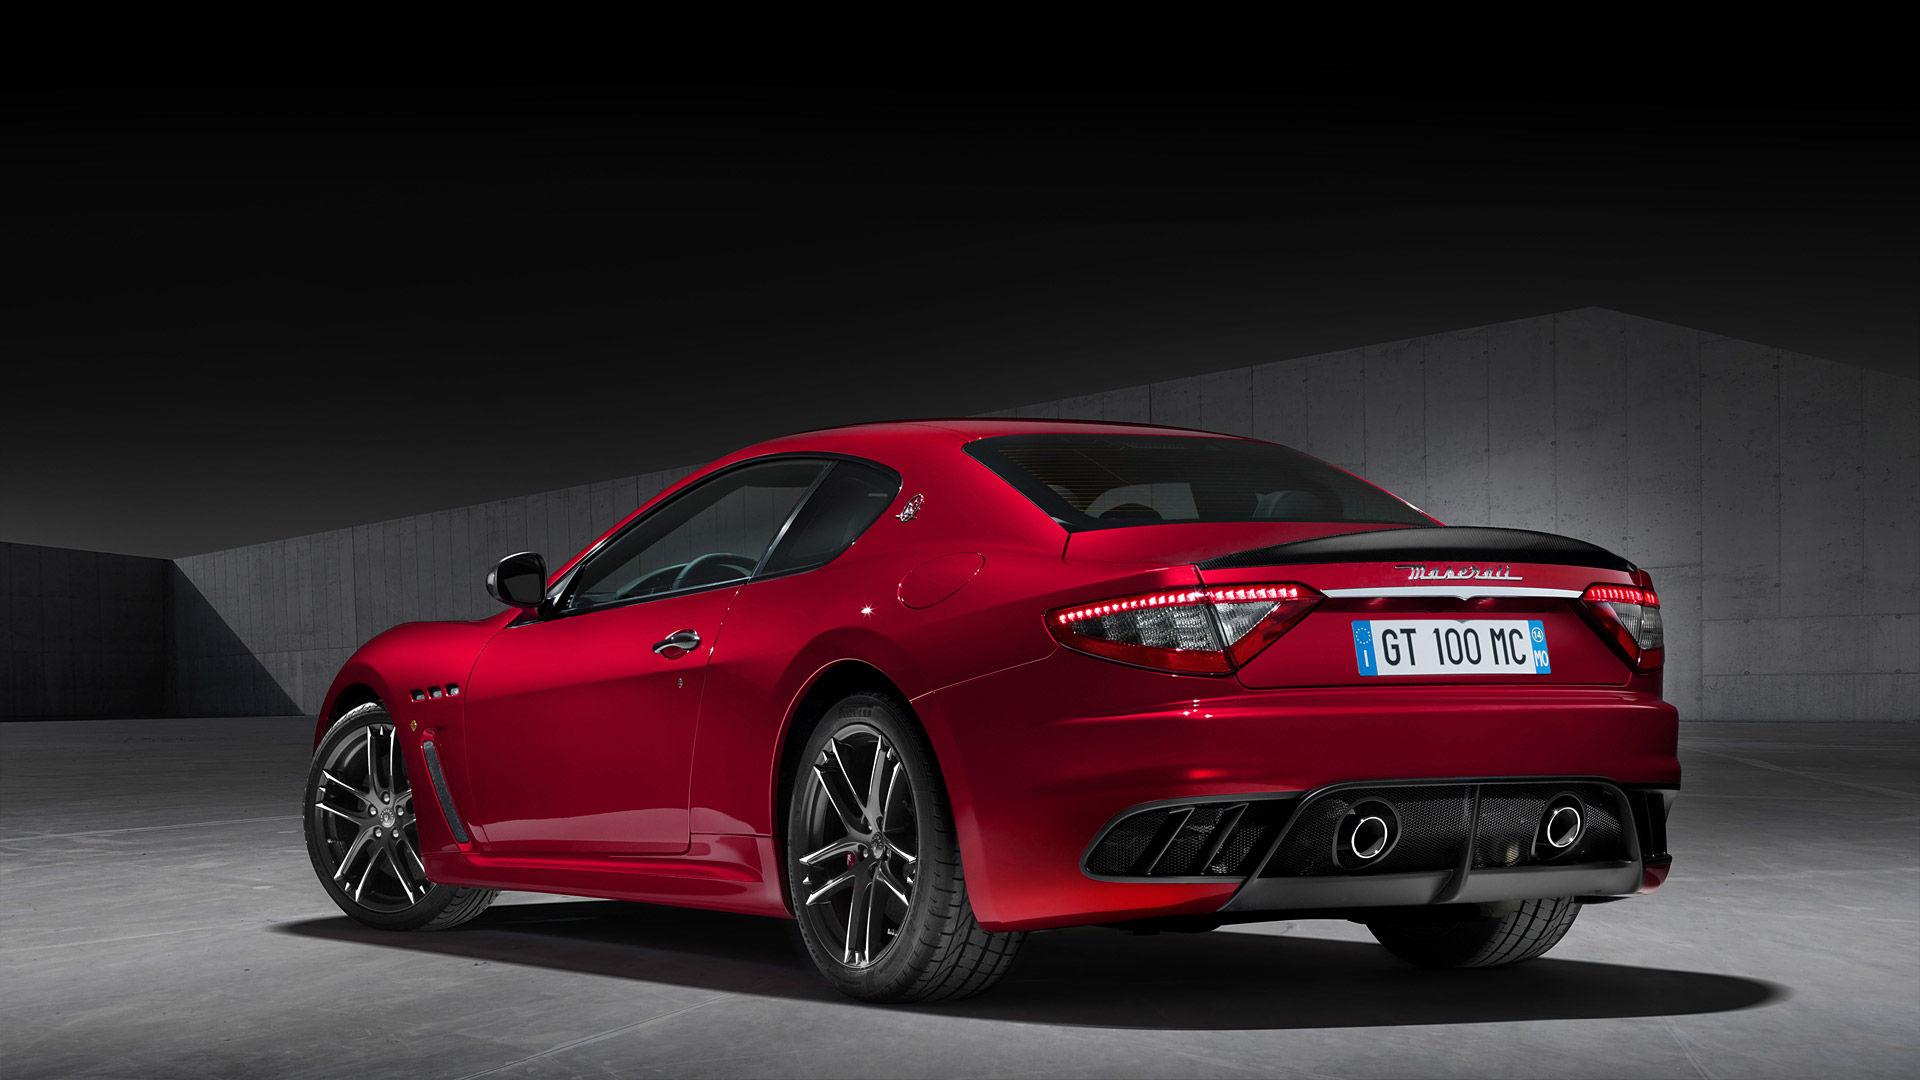 2015 Maserati GranTurismo MC Stradale Centennial Edition